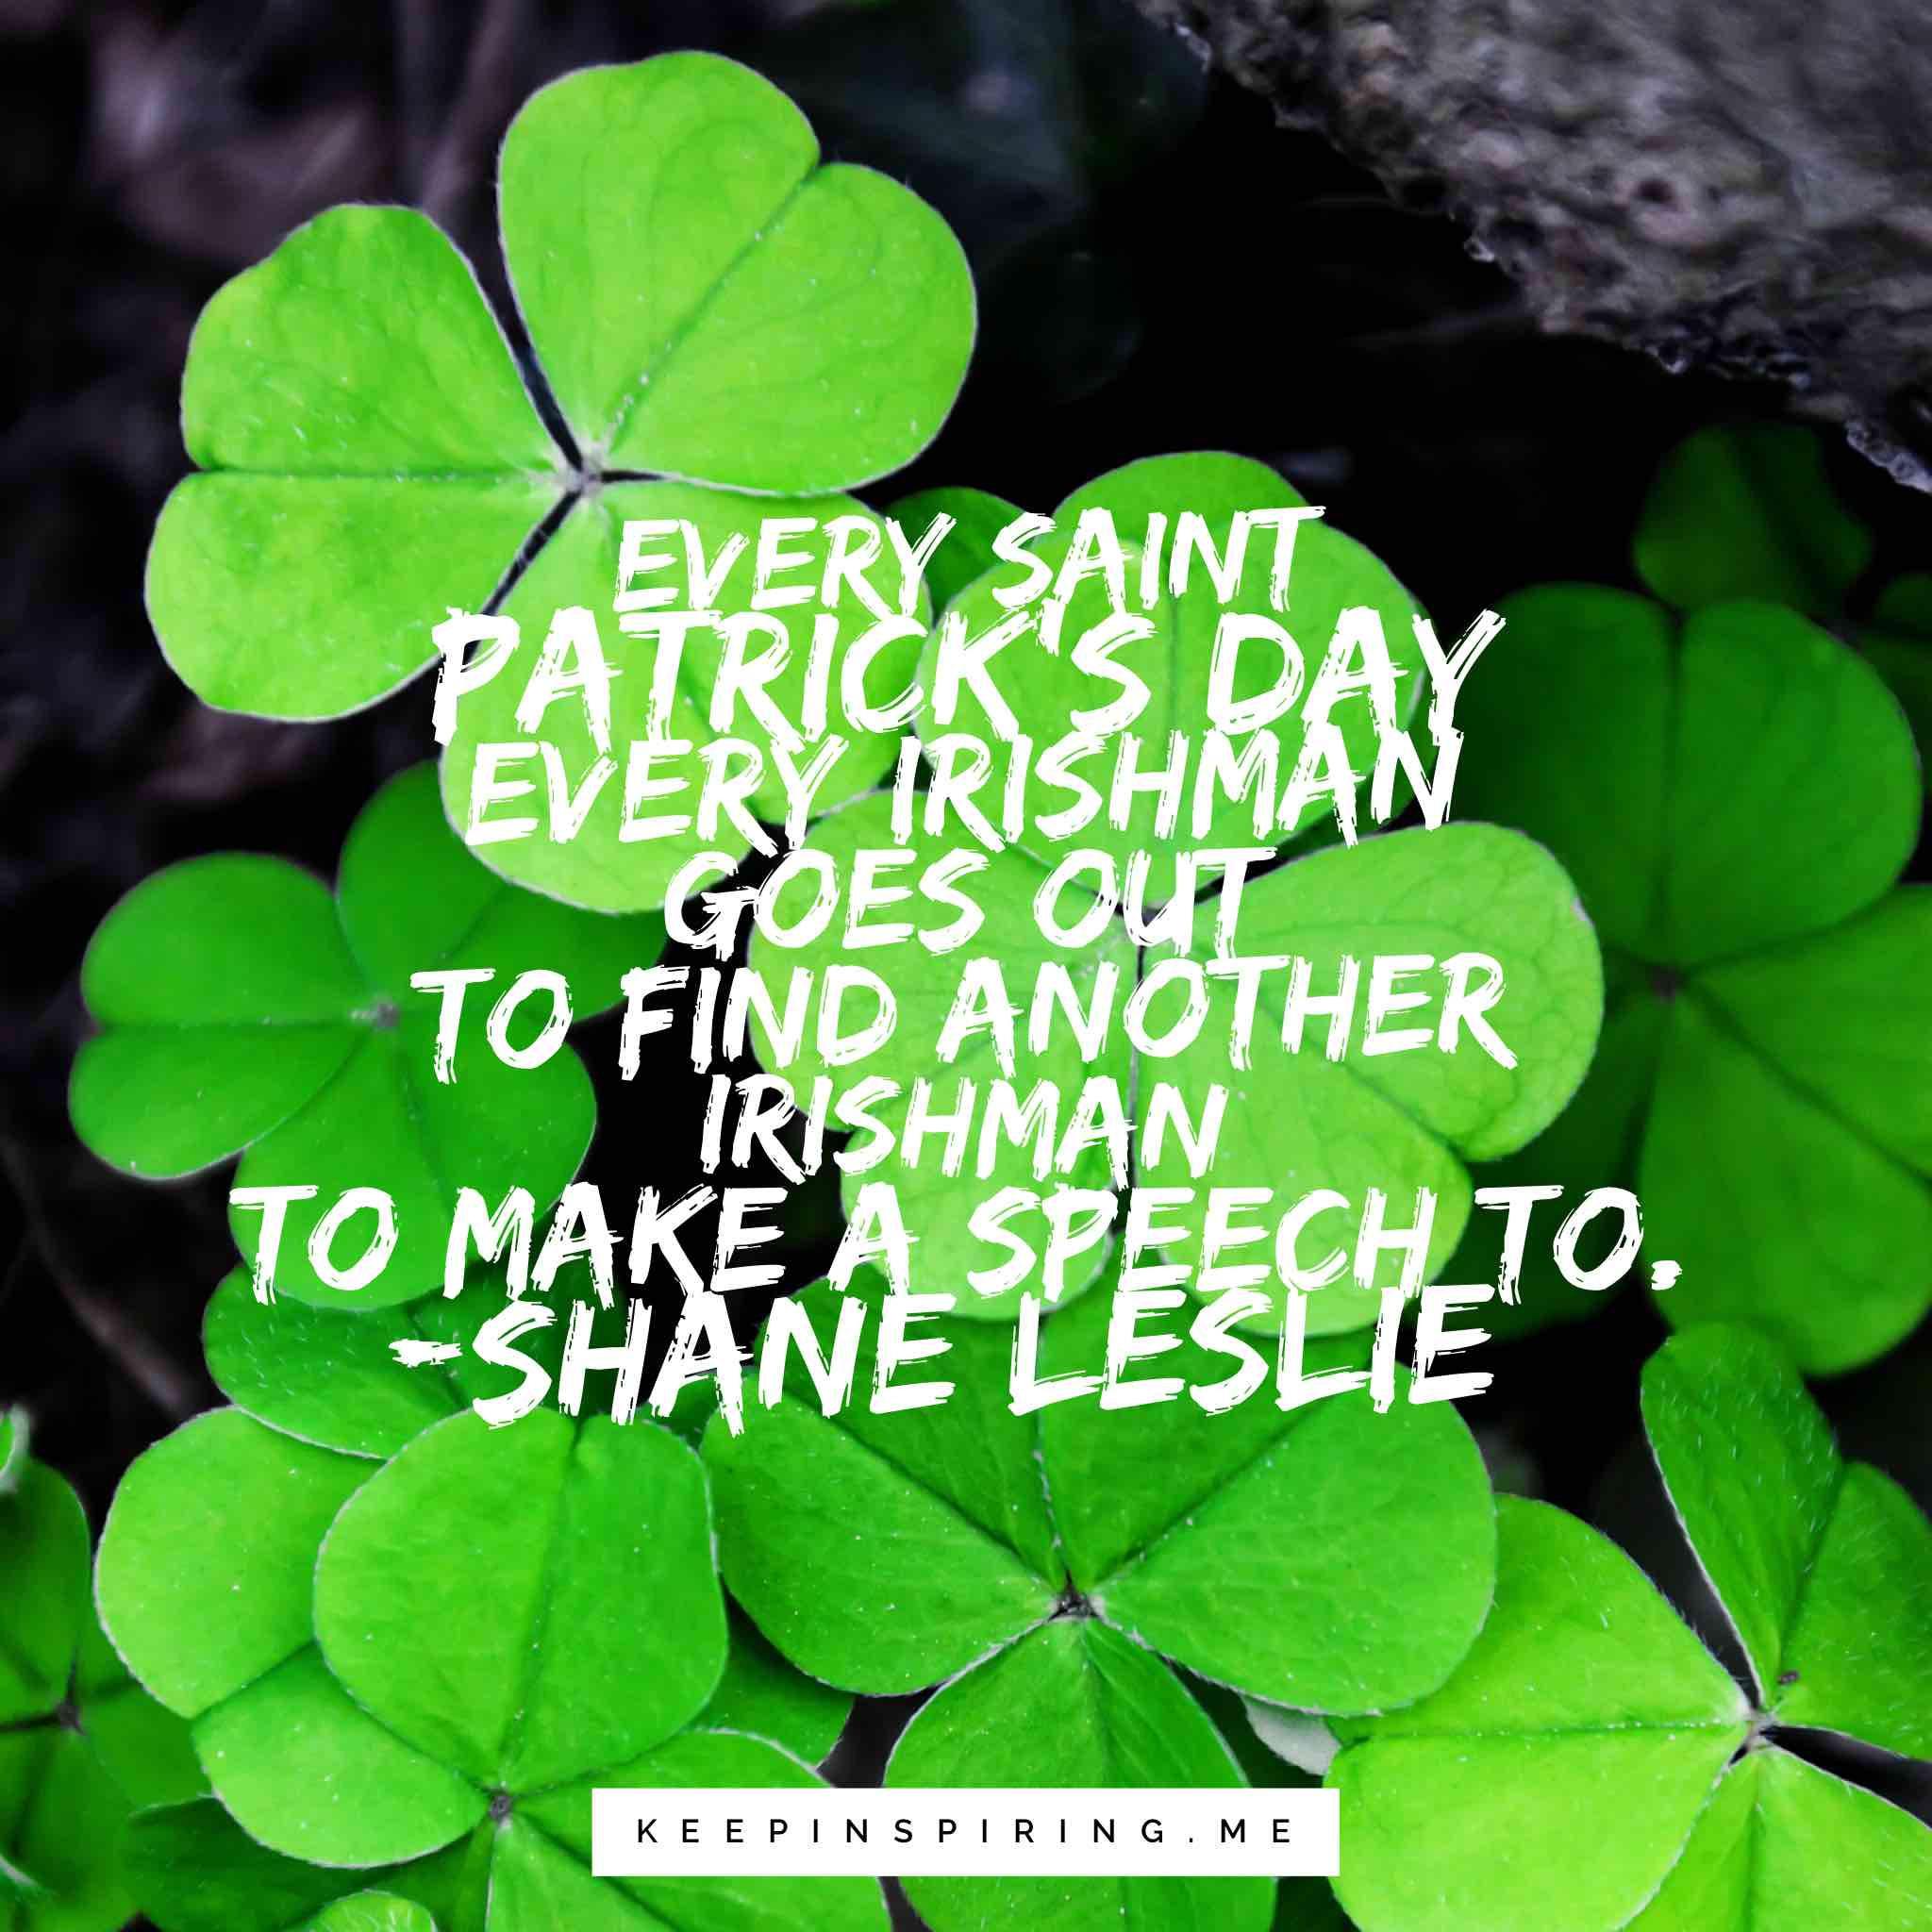 Saint Patrick's Day Quotes  17 Saint Patrick s Day Quotes to Celebrate the Irish